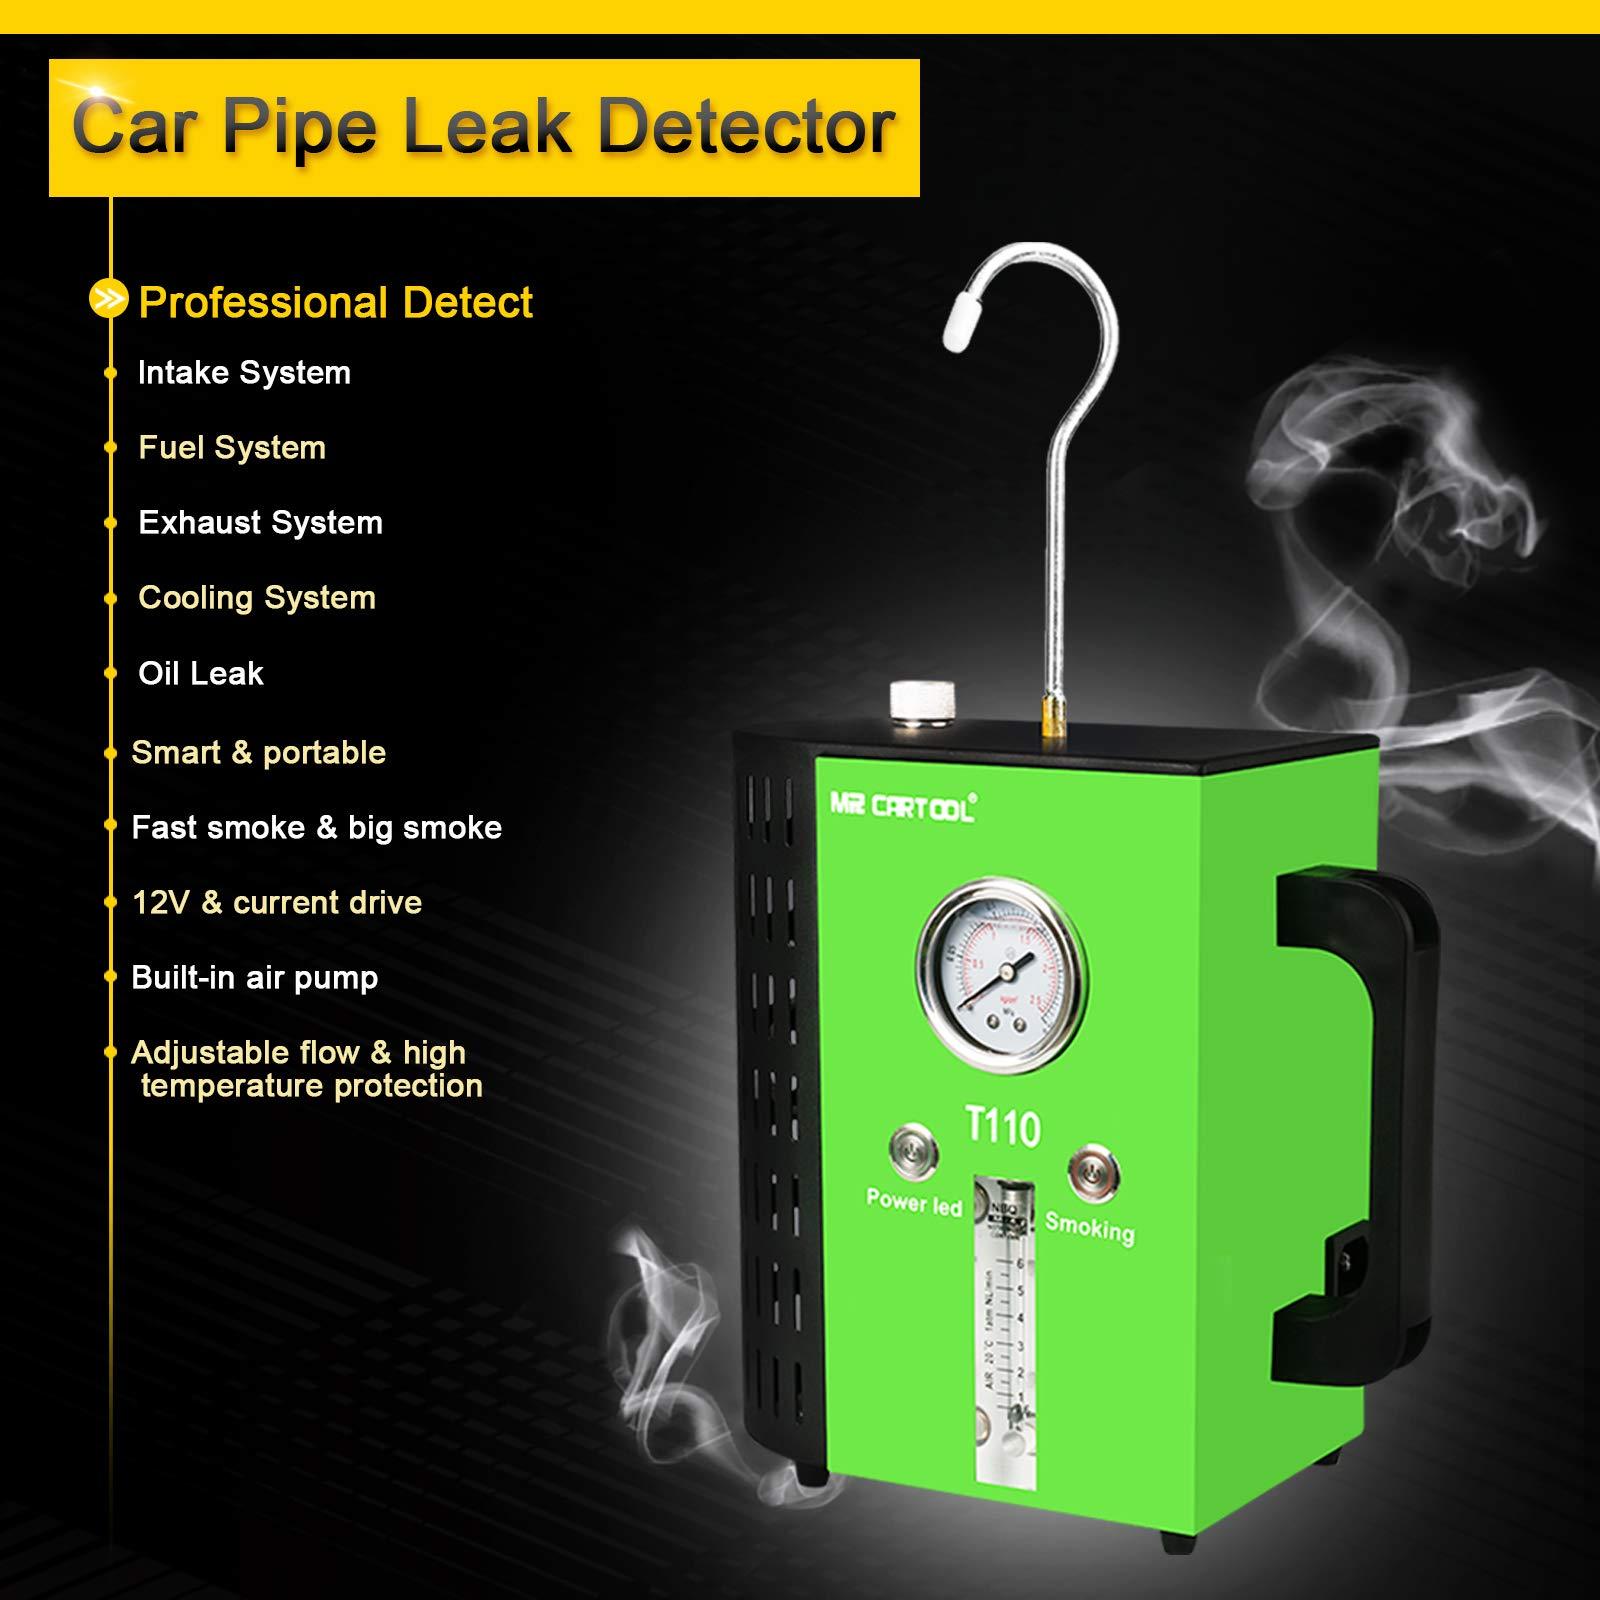 T110 12V Automotive Fuel Leak Detectors Cars Leak Locator Tester Car Fuel Leak Detectors Car Pipe Leakage Tester Support EVAP for All Vehicles by T110 (Image #3)